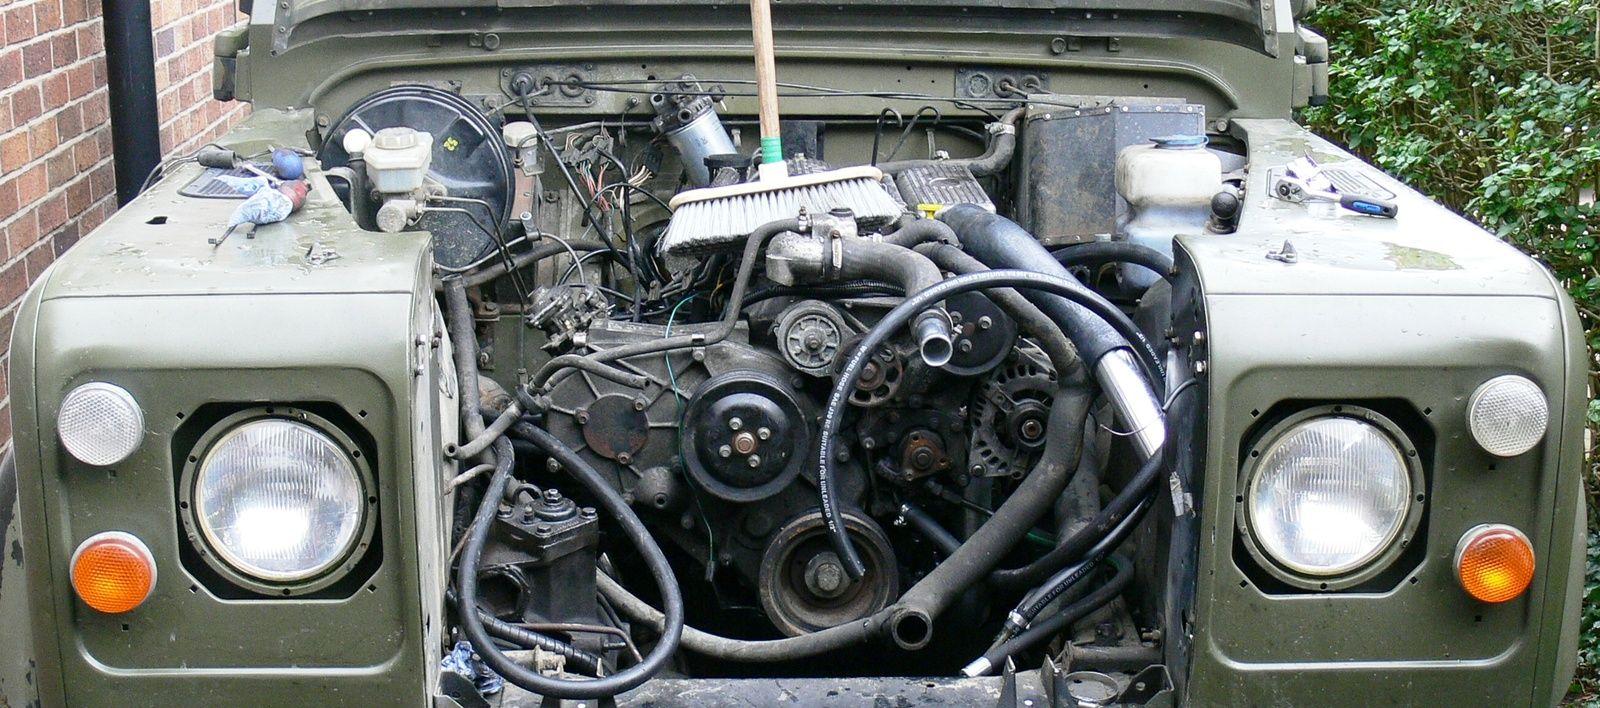 300tdi engine conversion